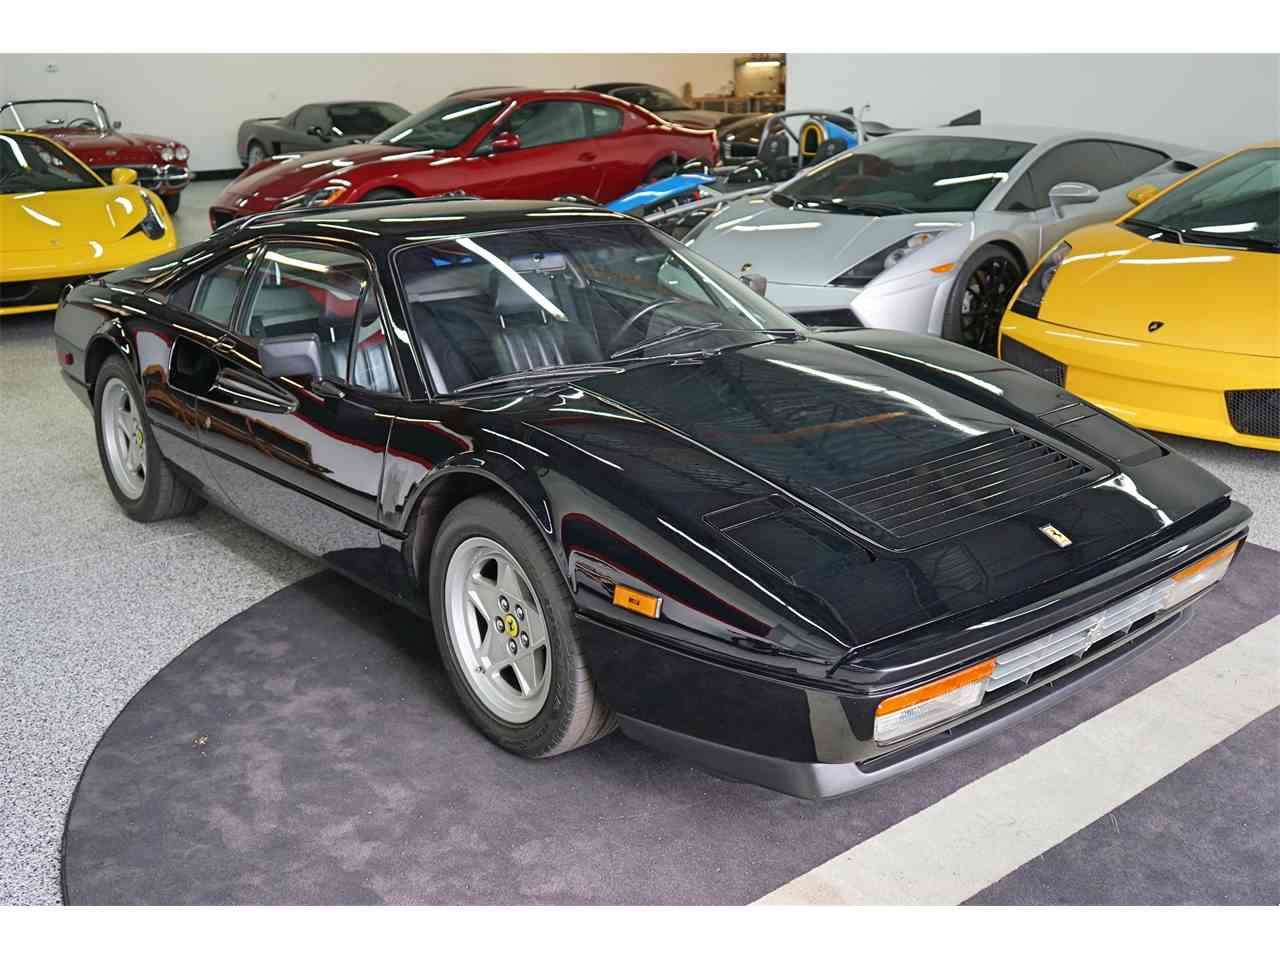 Classic ferrari 328 for sale on classiccars 14 available 1986 ferrari 328 969974 vanachro Image collections